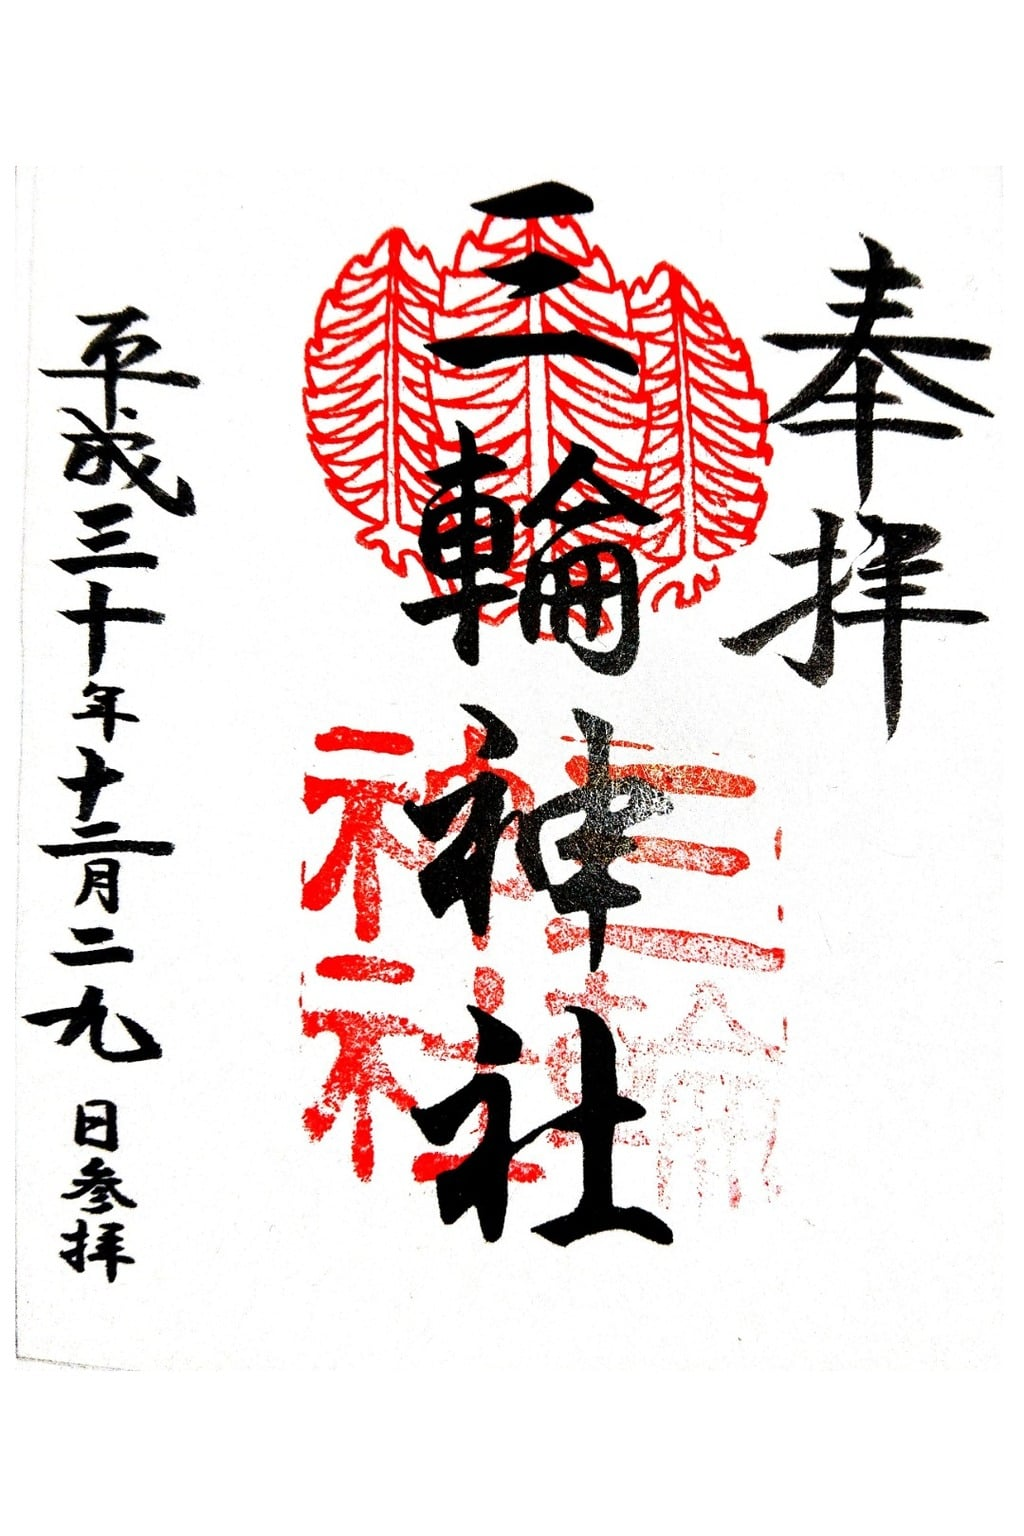 三輪神社の御朱印